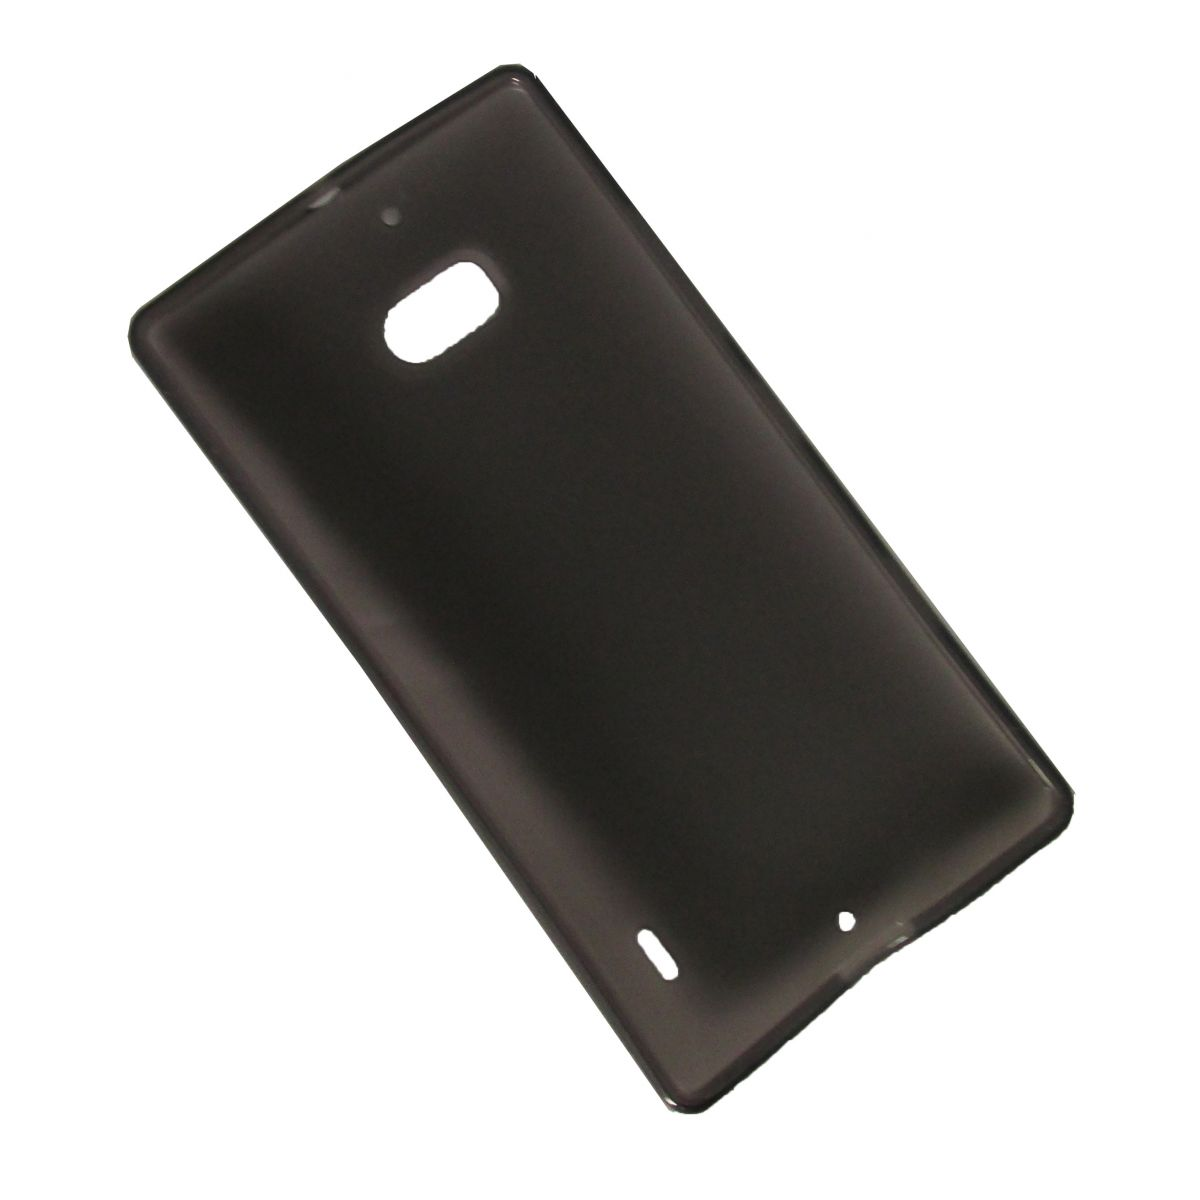 Capa de Tpu para Nokia Lumia Icon 929 930 N929 N930 + Pelicula Grafite